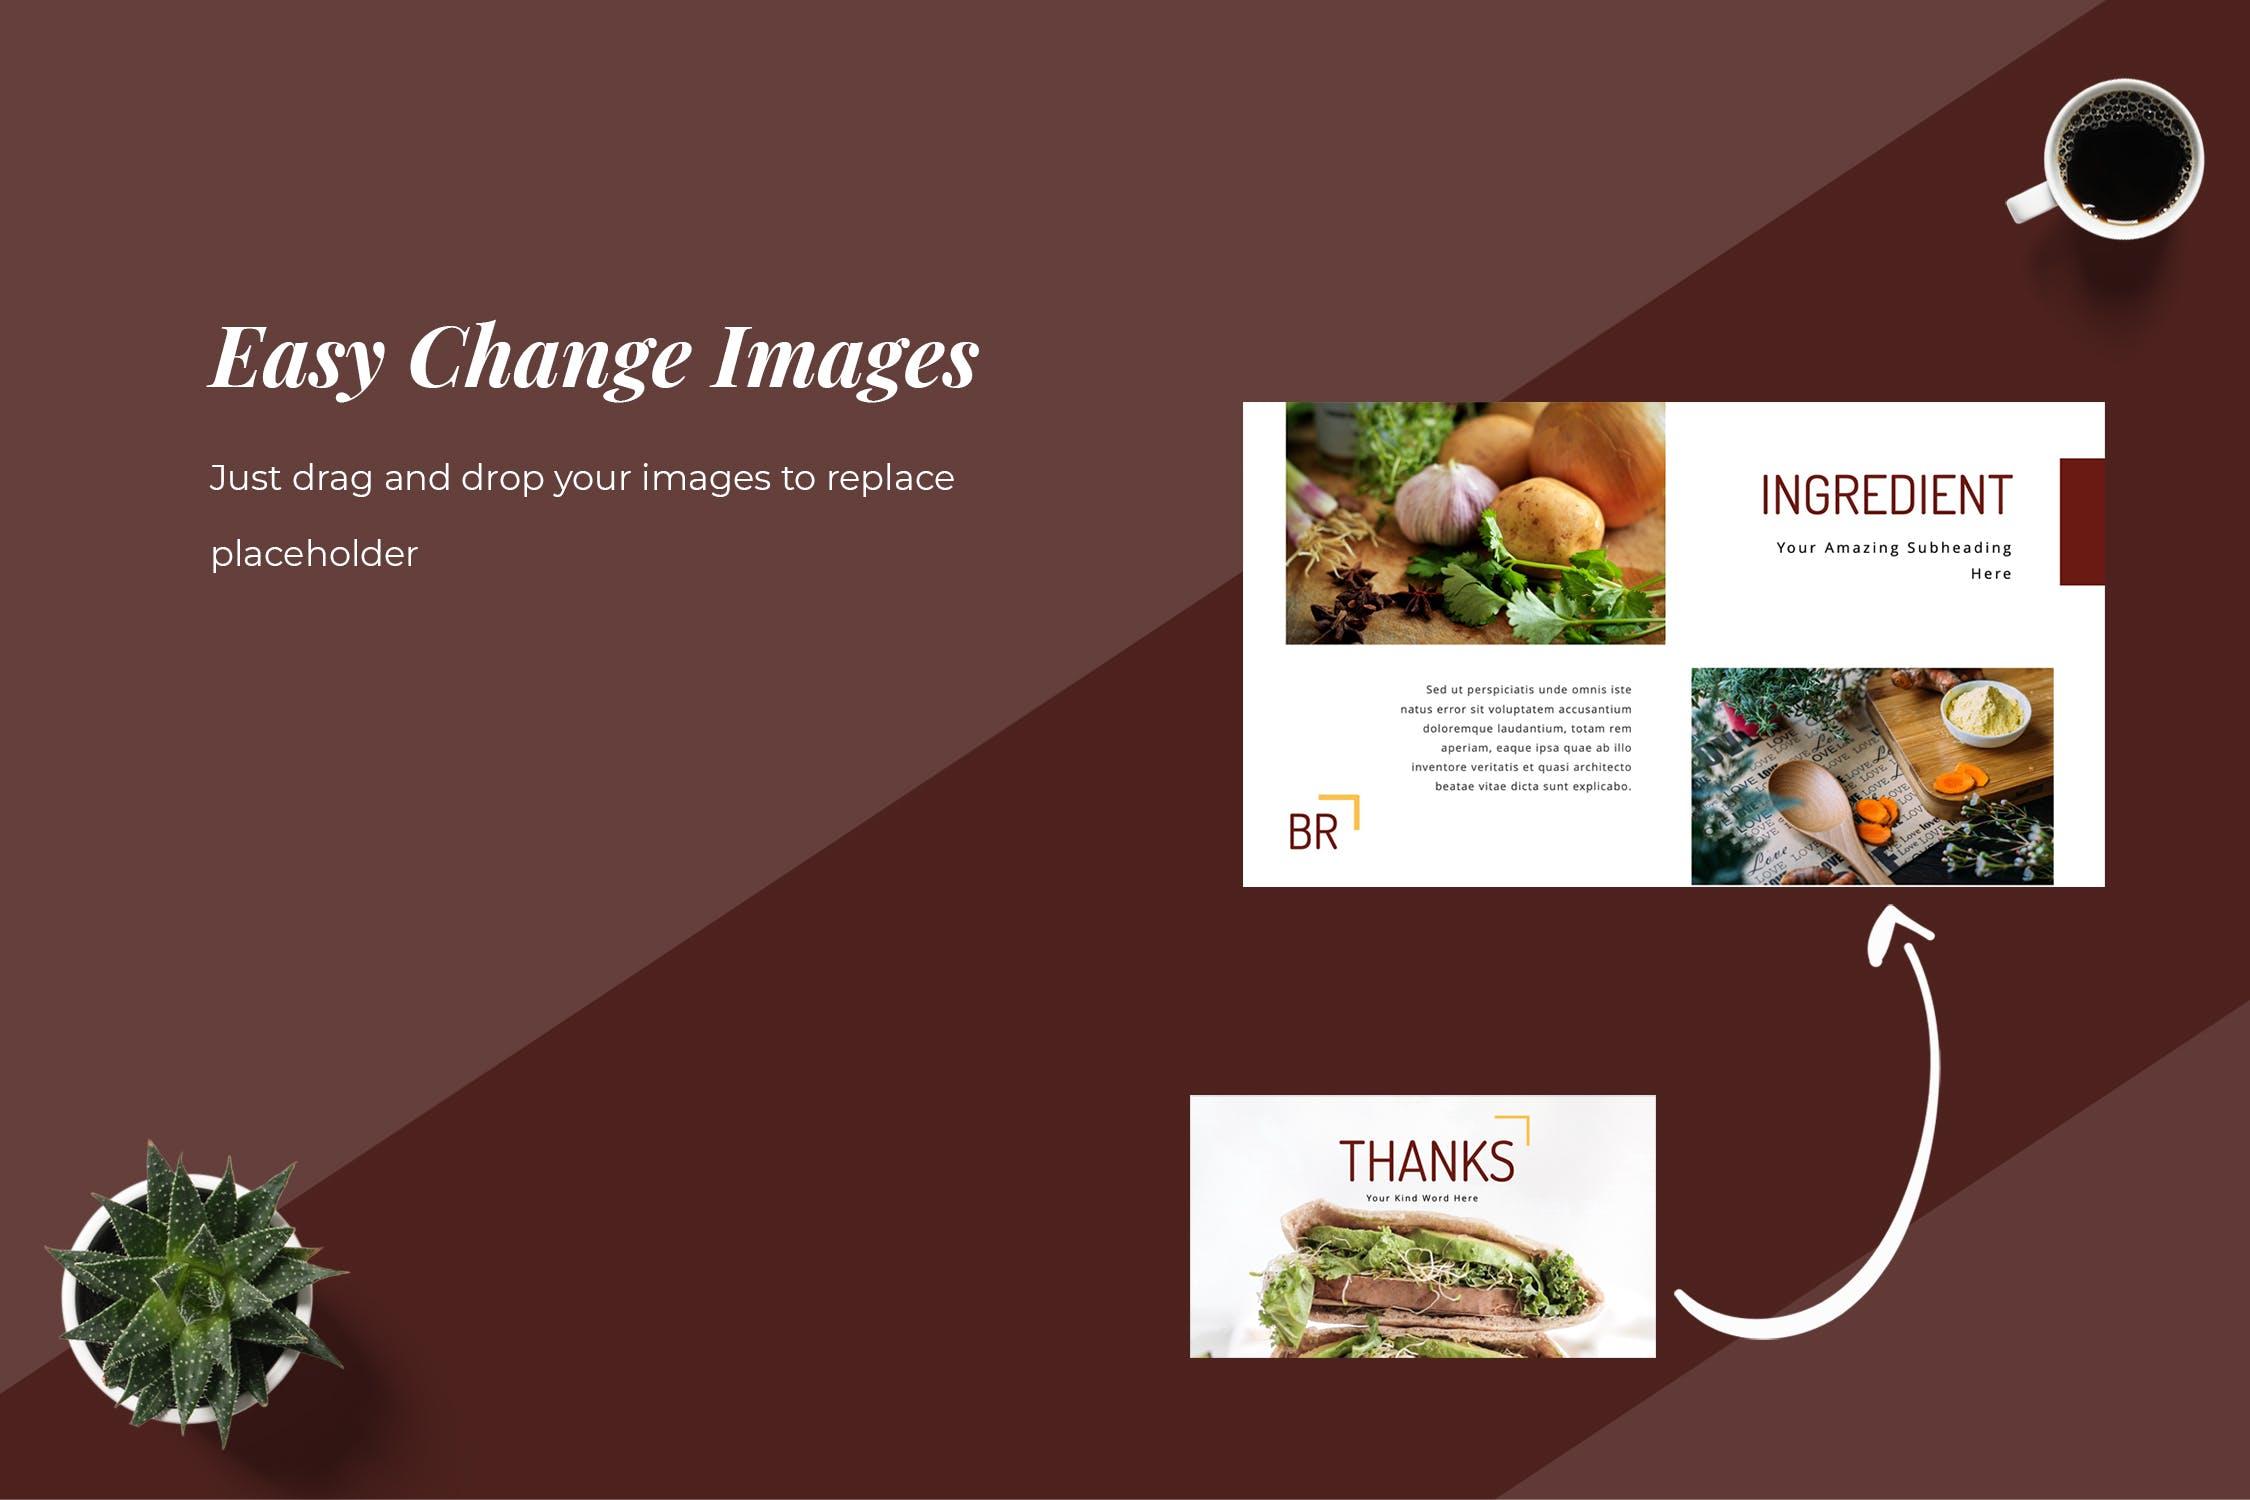 早餐-食物美食类展示模板Breakfa Food Powerpoint Presentation插图(5)